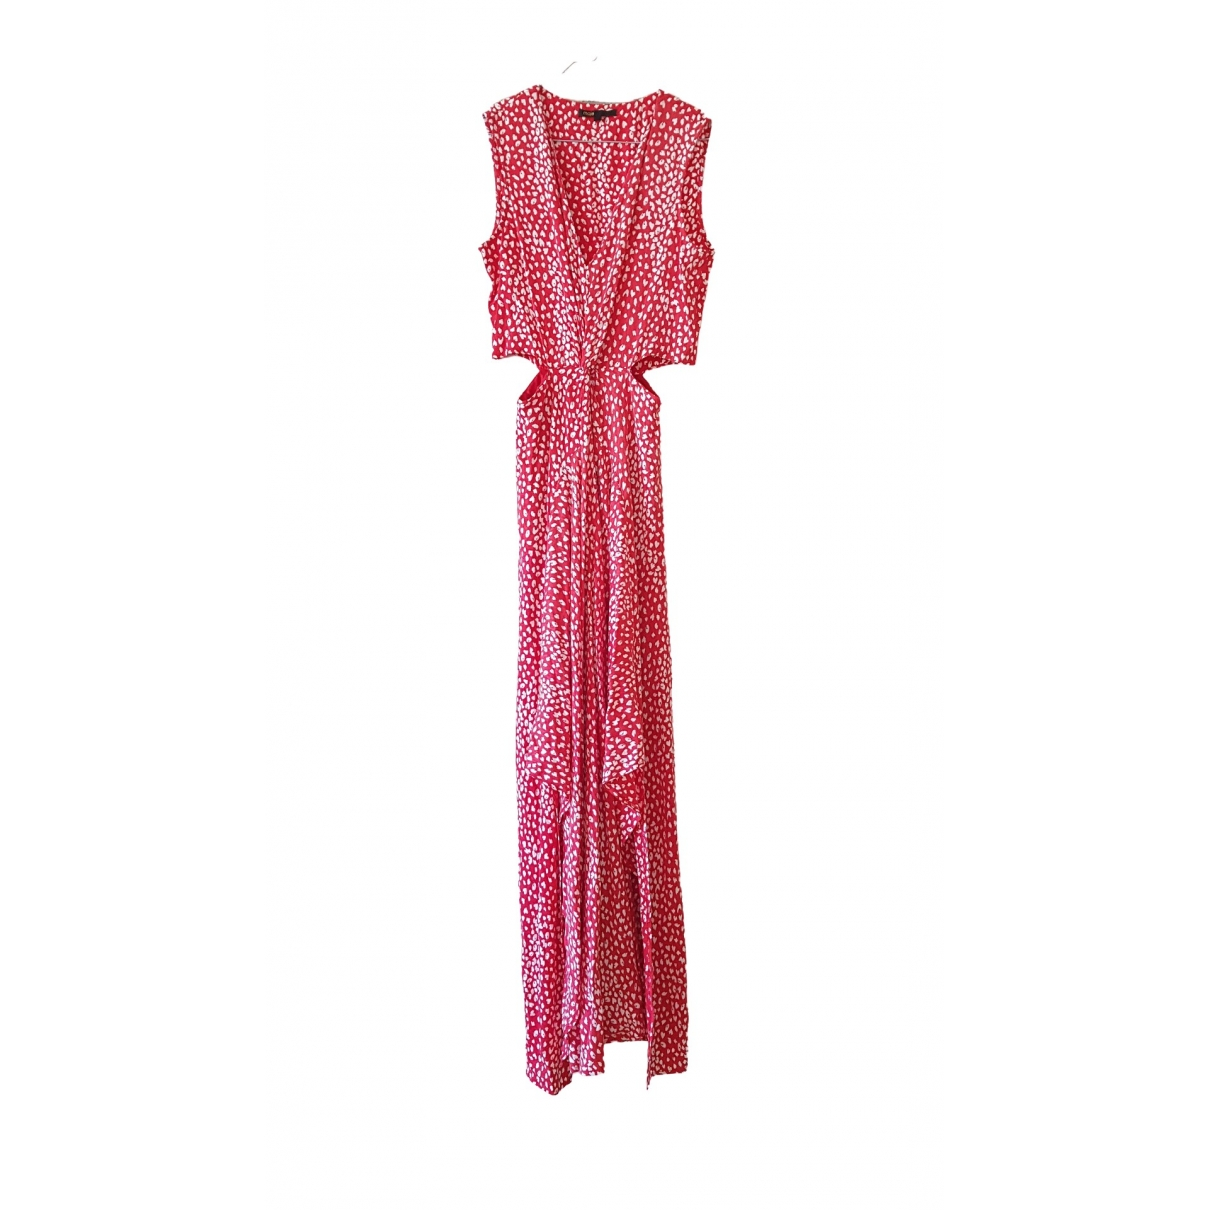 Maje Spring Summer 2019 Kleid in  Rot Baumwolle